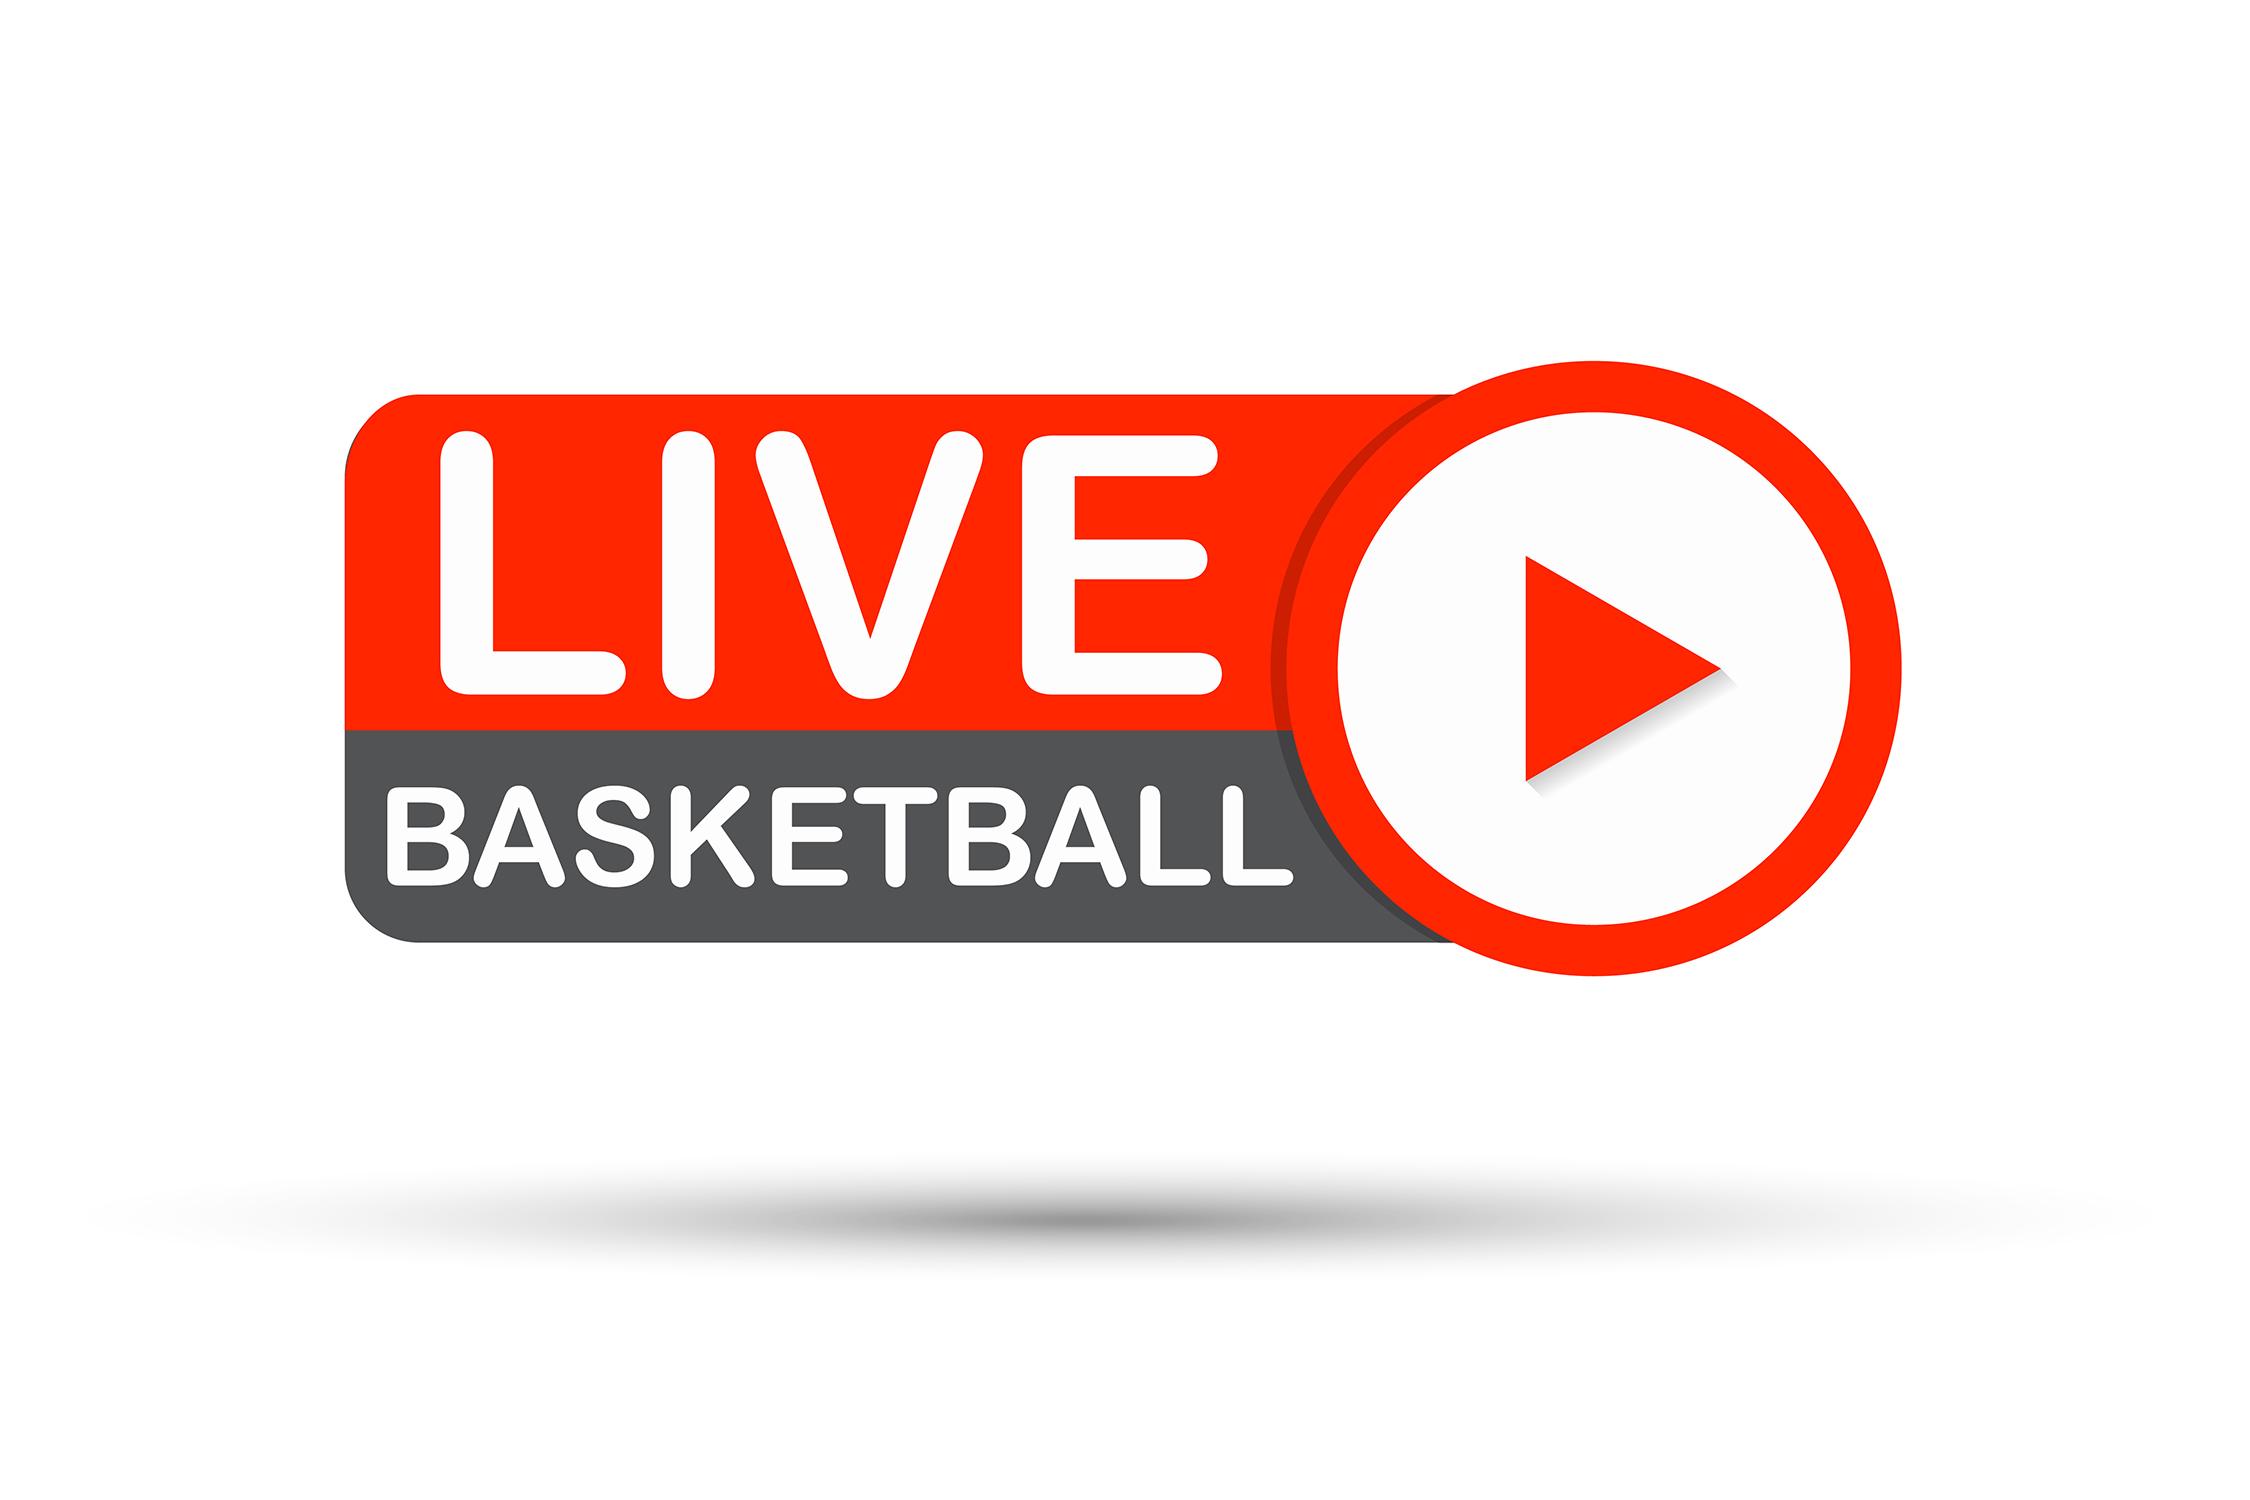 Live Basketball play button